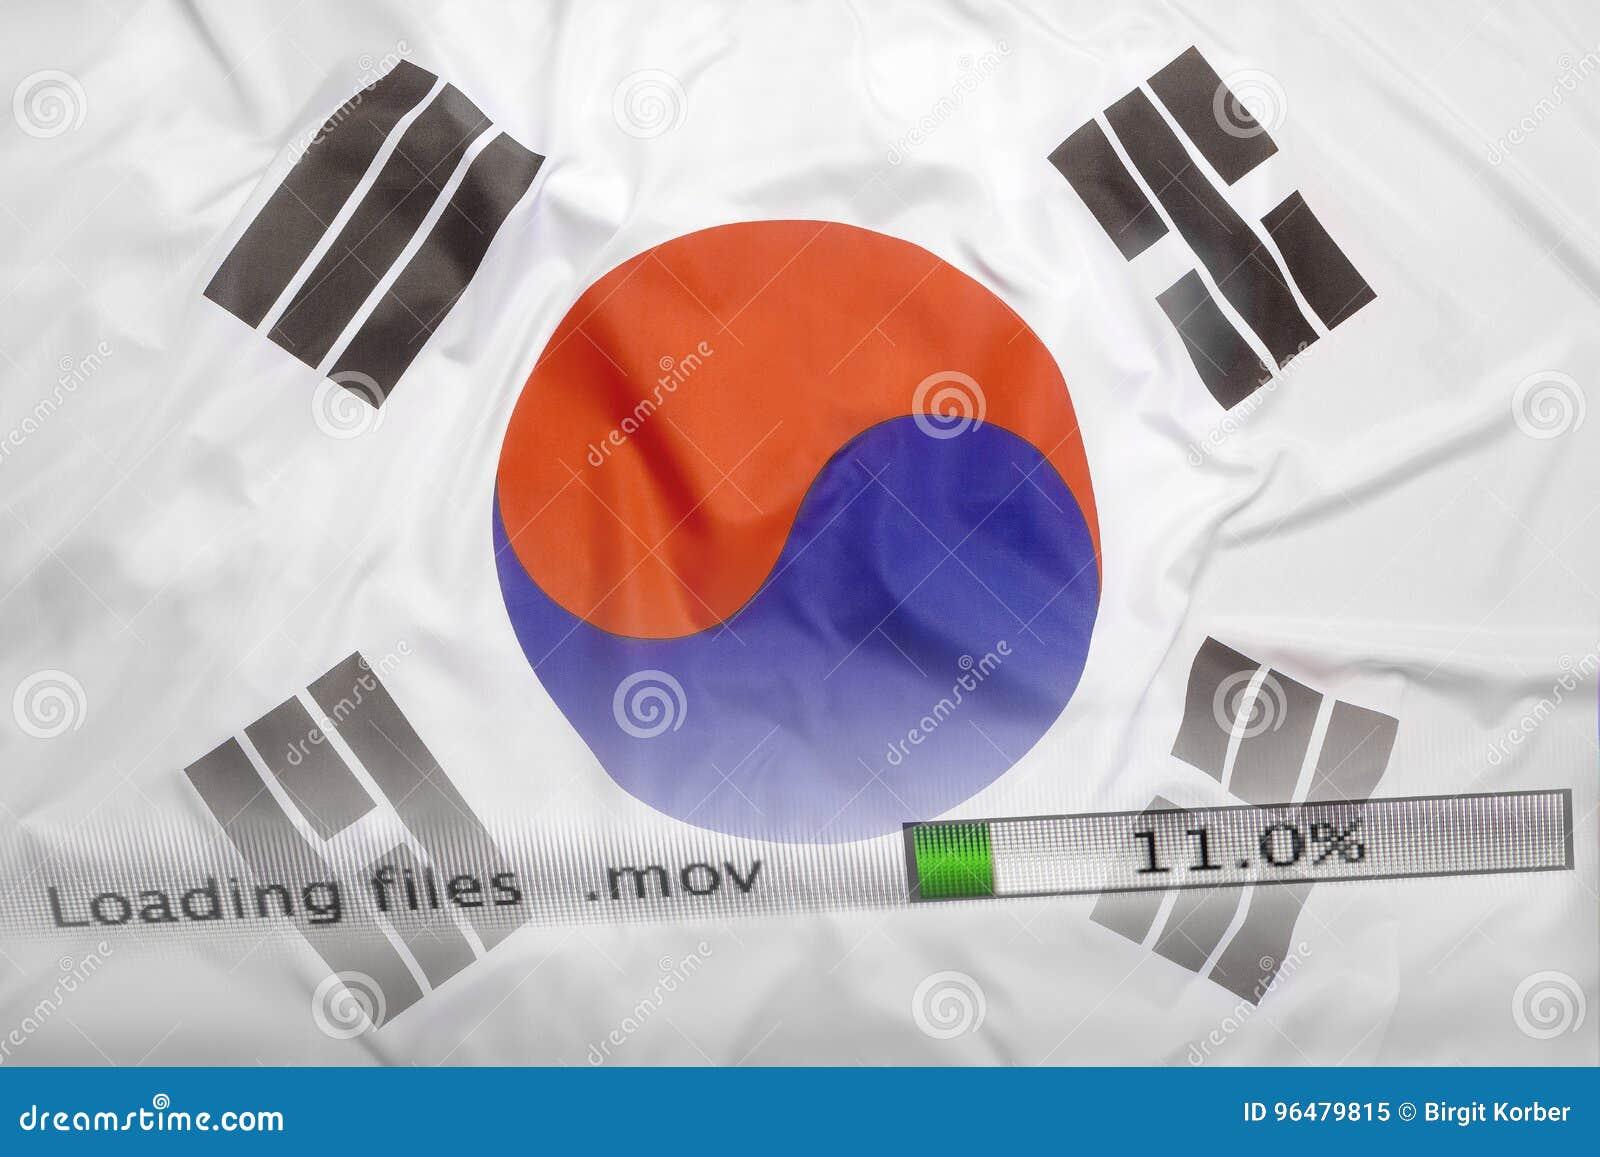 Downloading files on a computer, South Korea flag